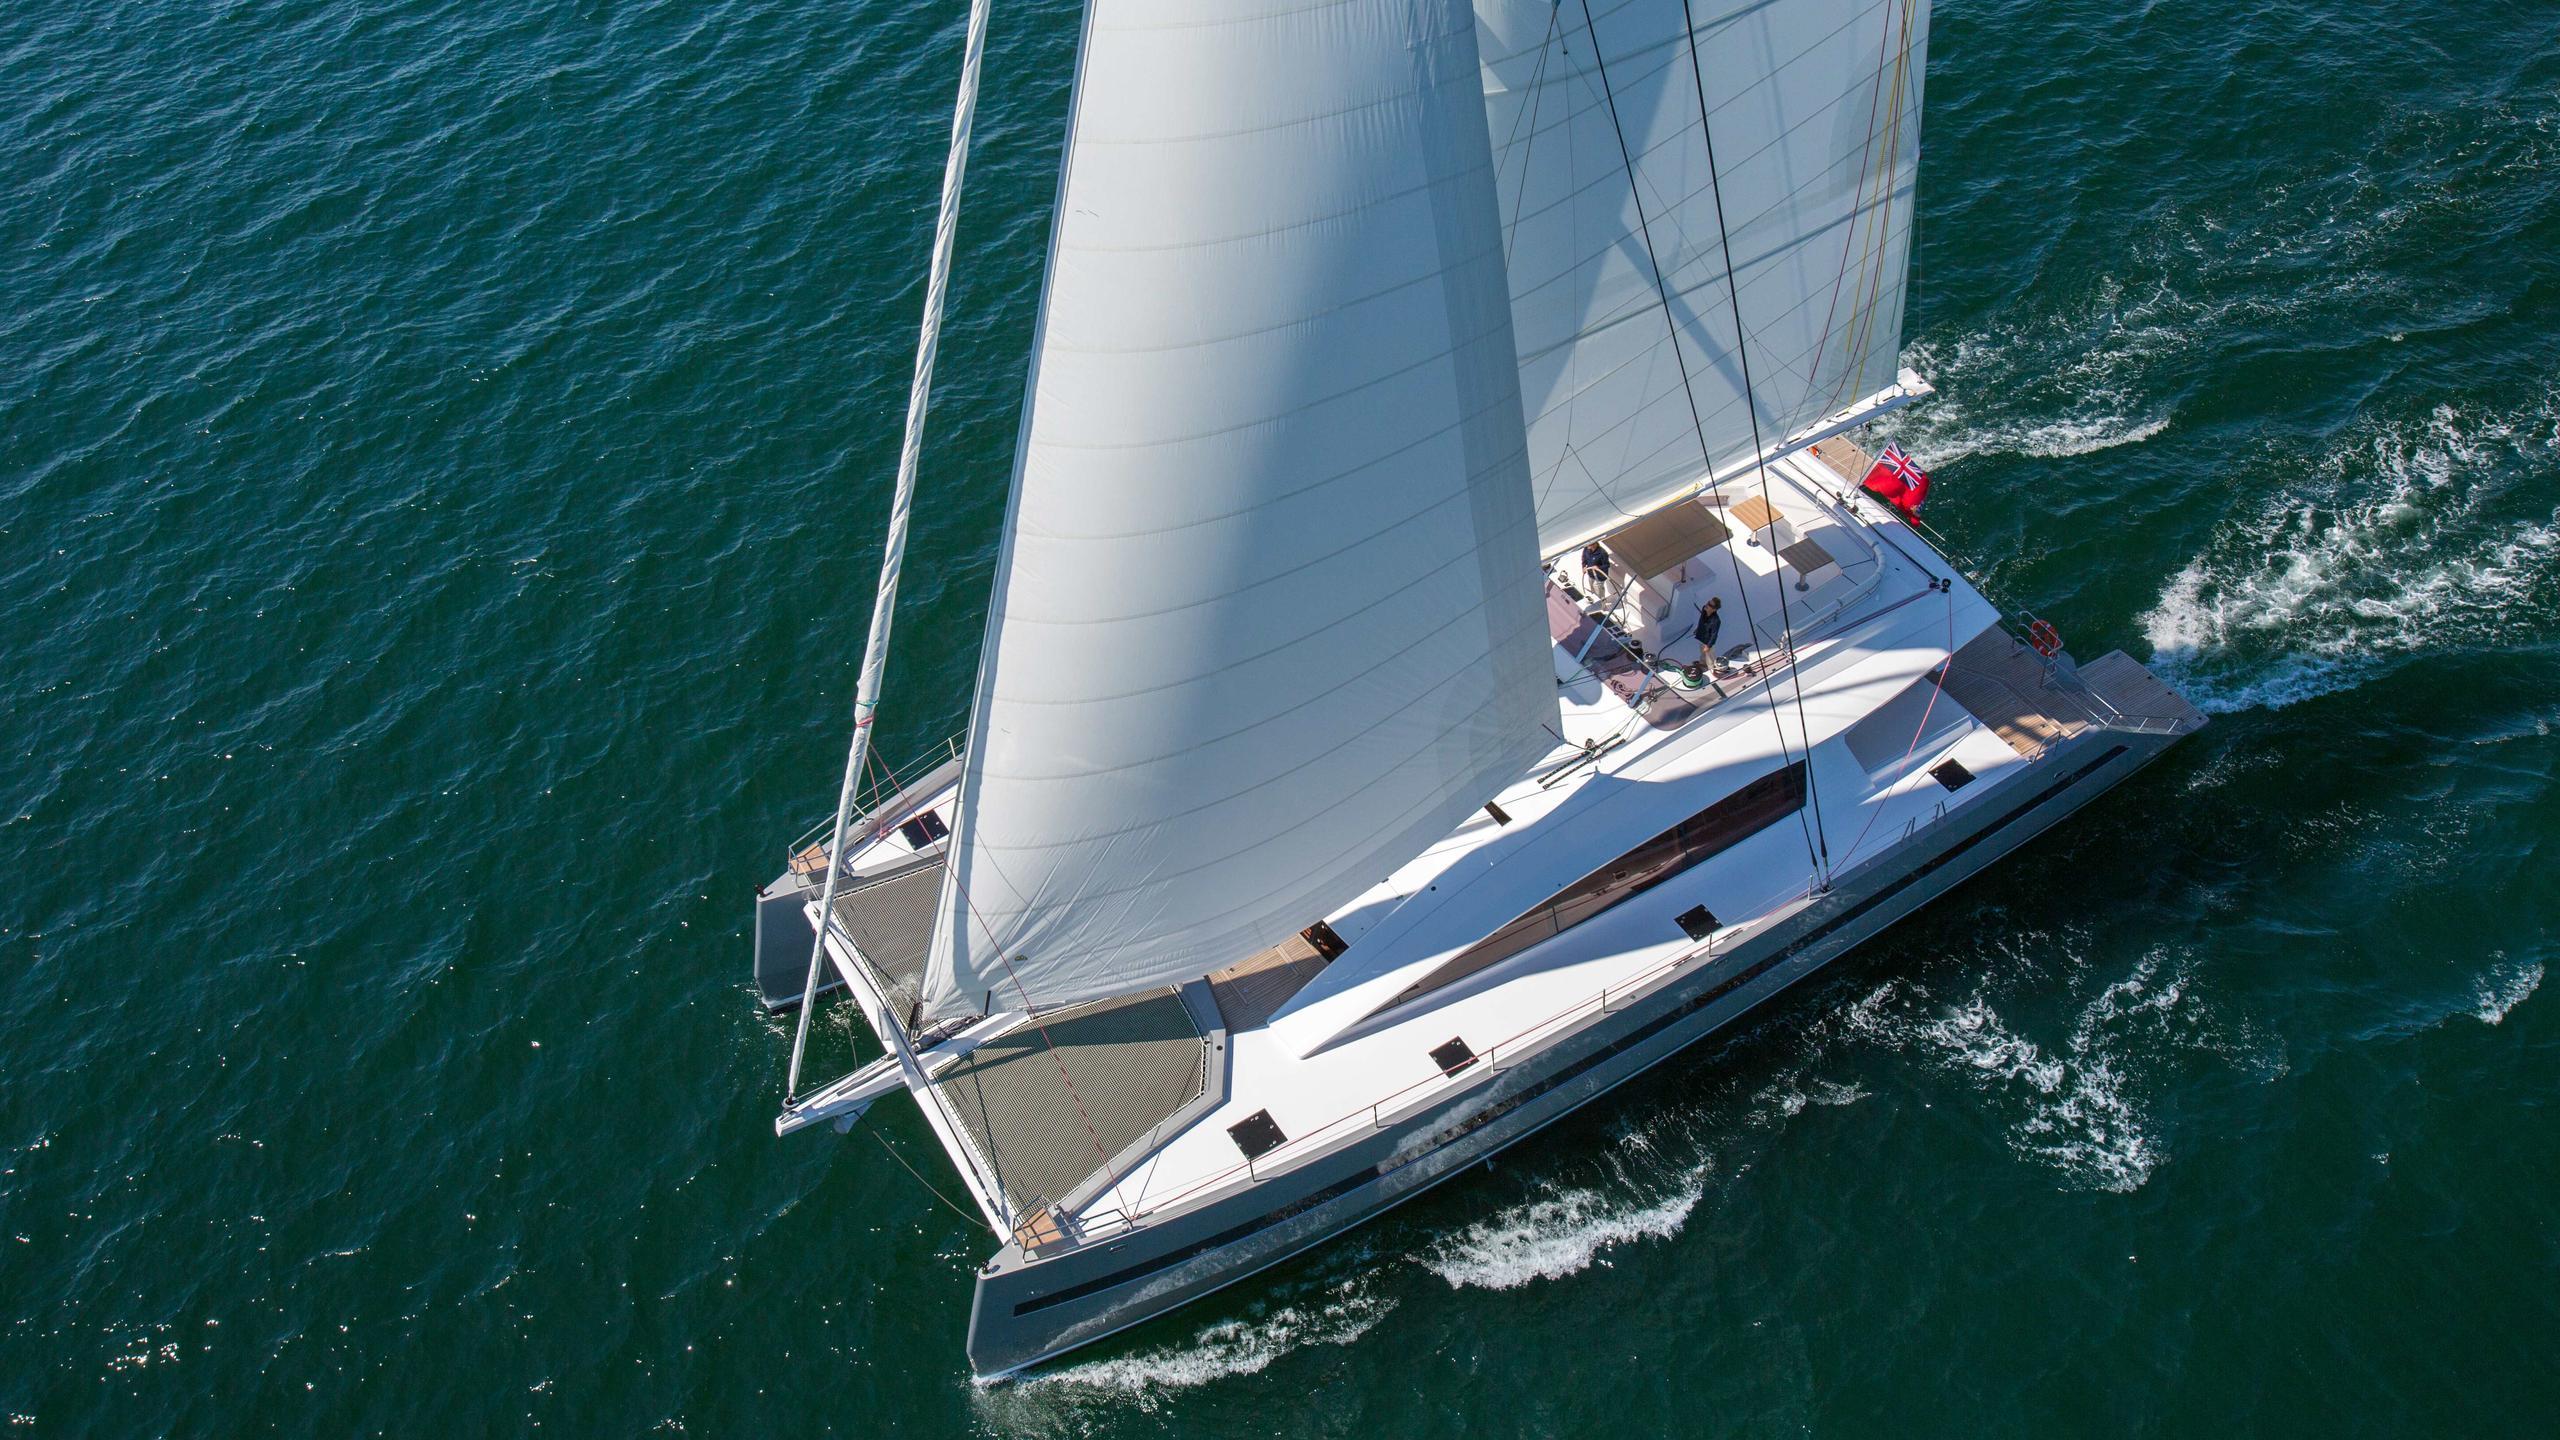 Windquest-catamaran-yacht-jfa-2014-26m-aerial